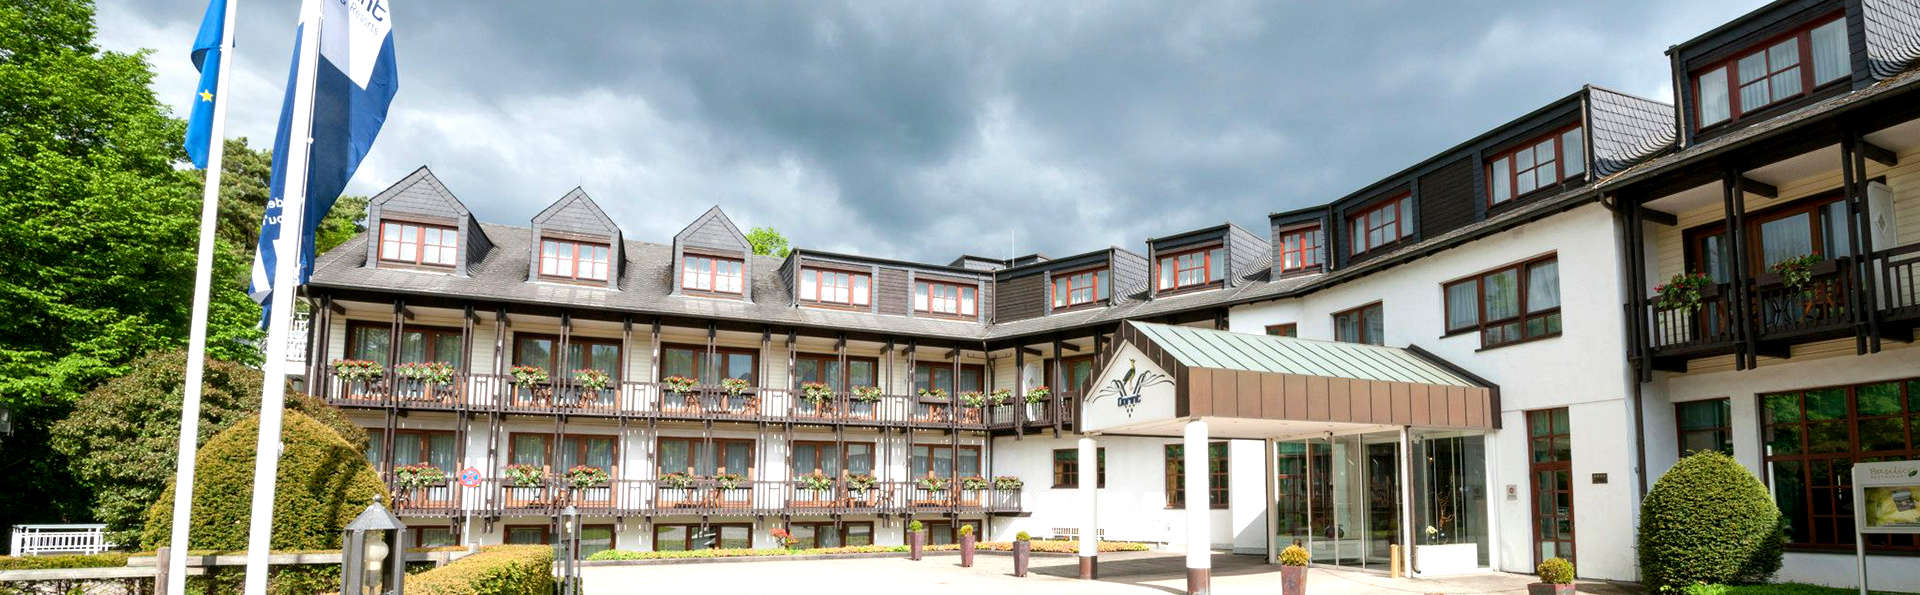 Dorint Hotel Venusberg Bonn - Edit_Front2.jpg